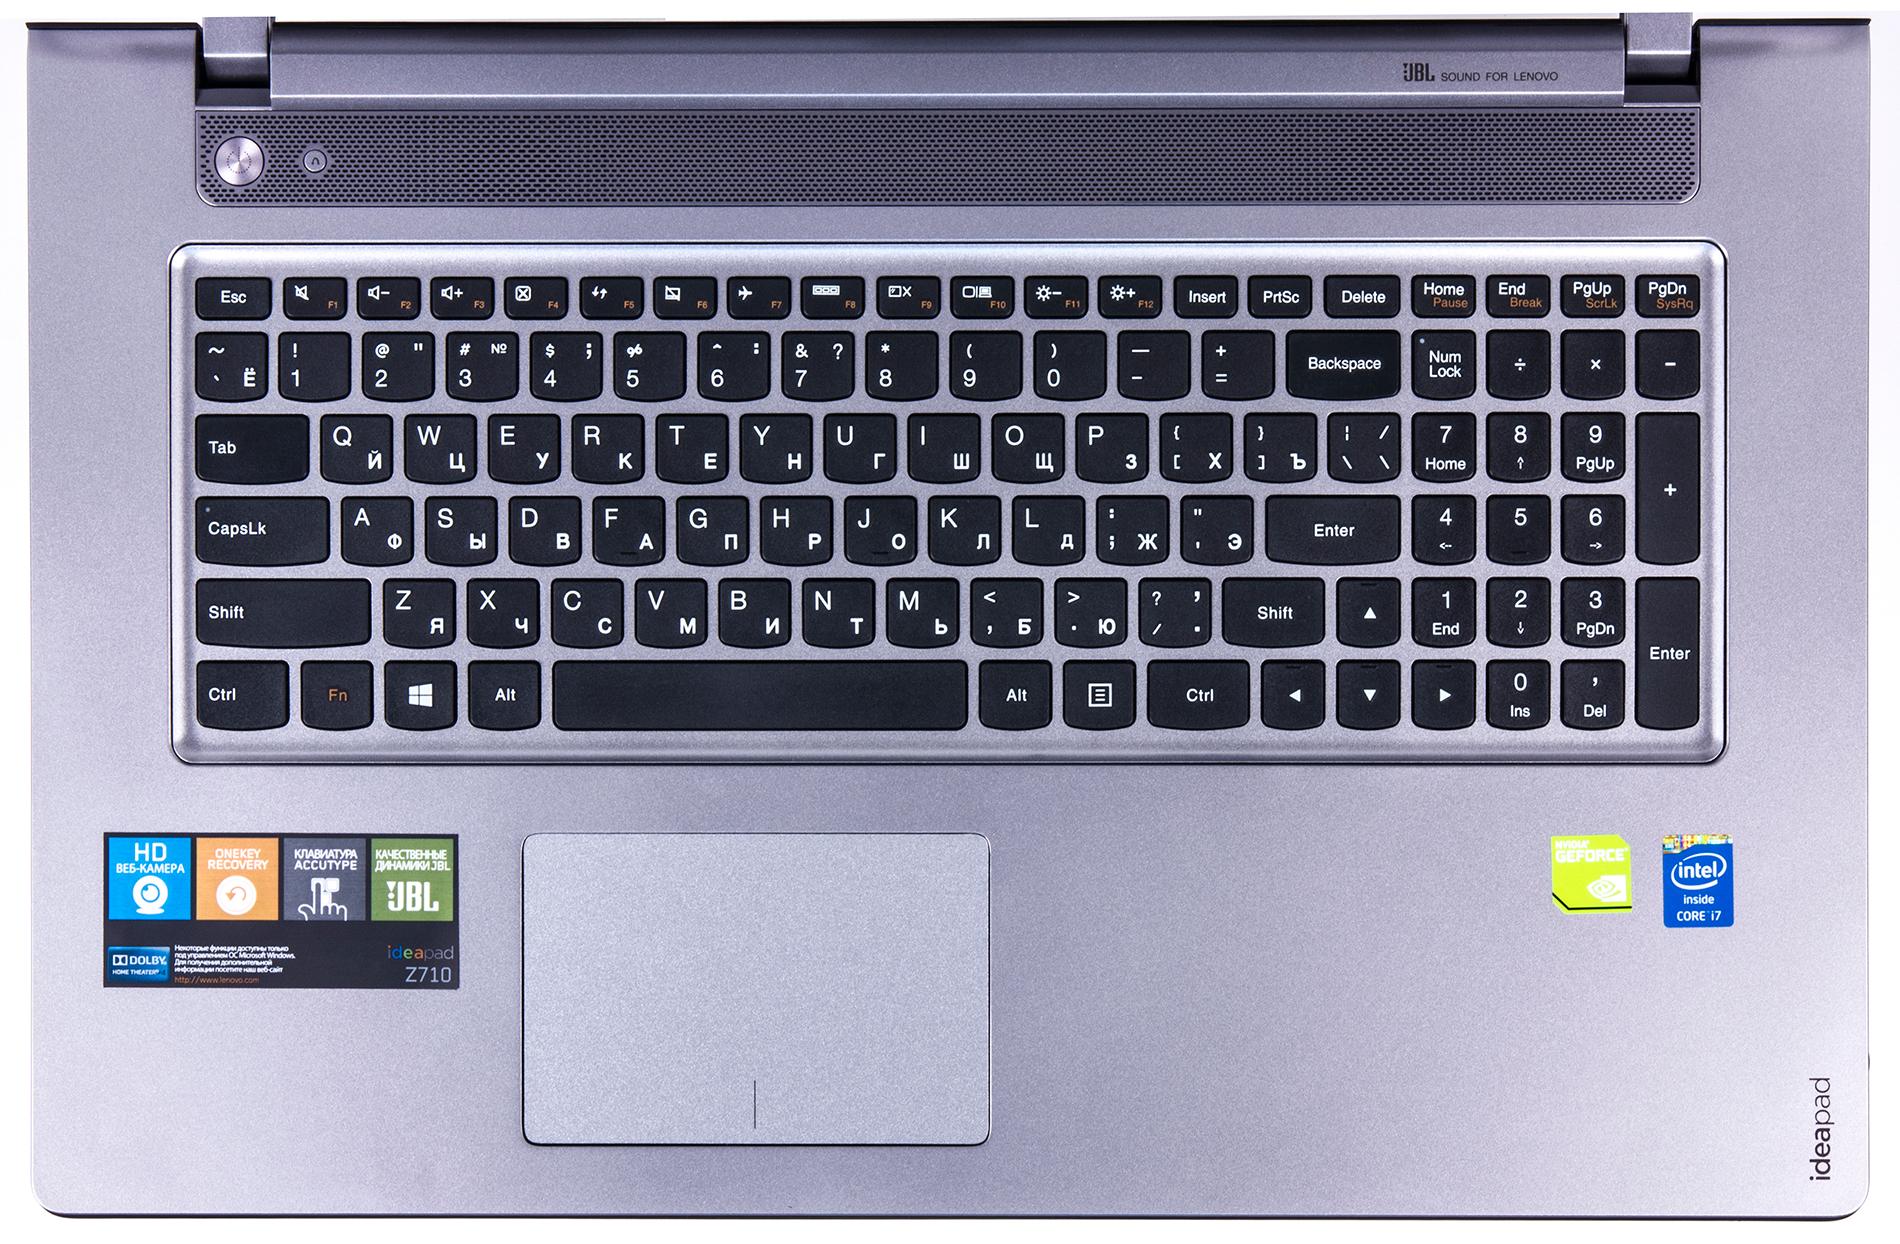 Lenovo IdeaPad Z710 Qualcomm WLAN Driver for Mac Download